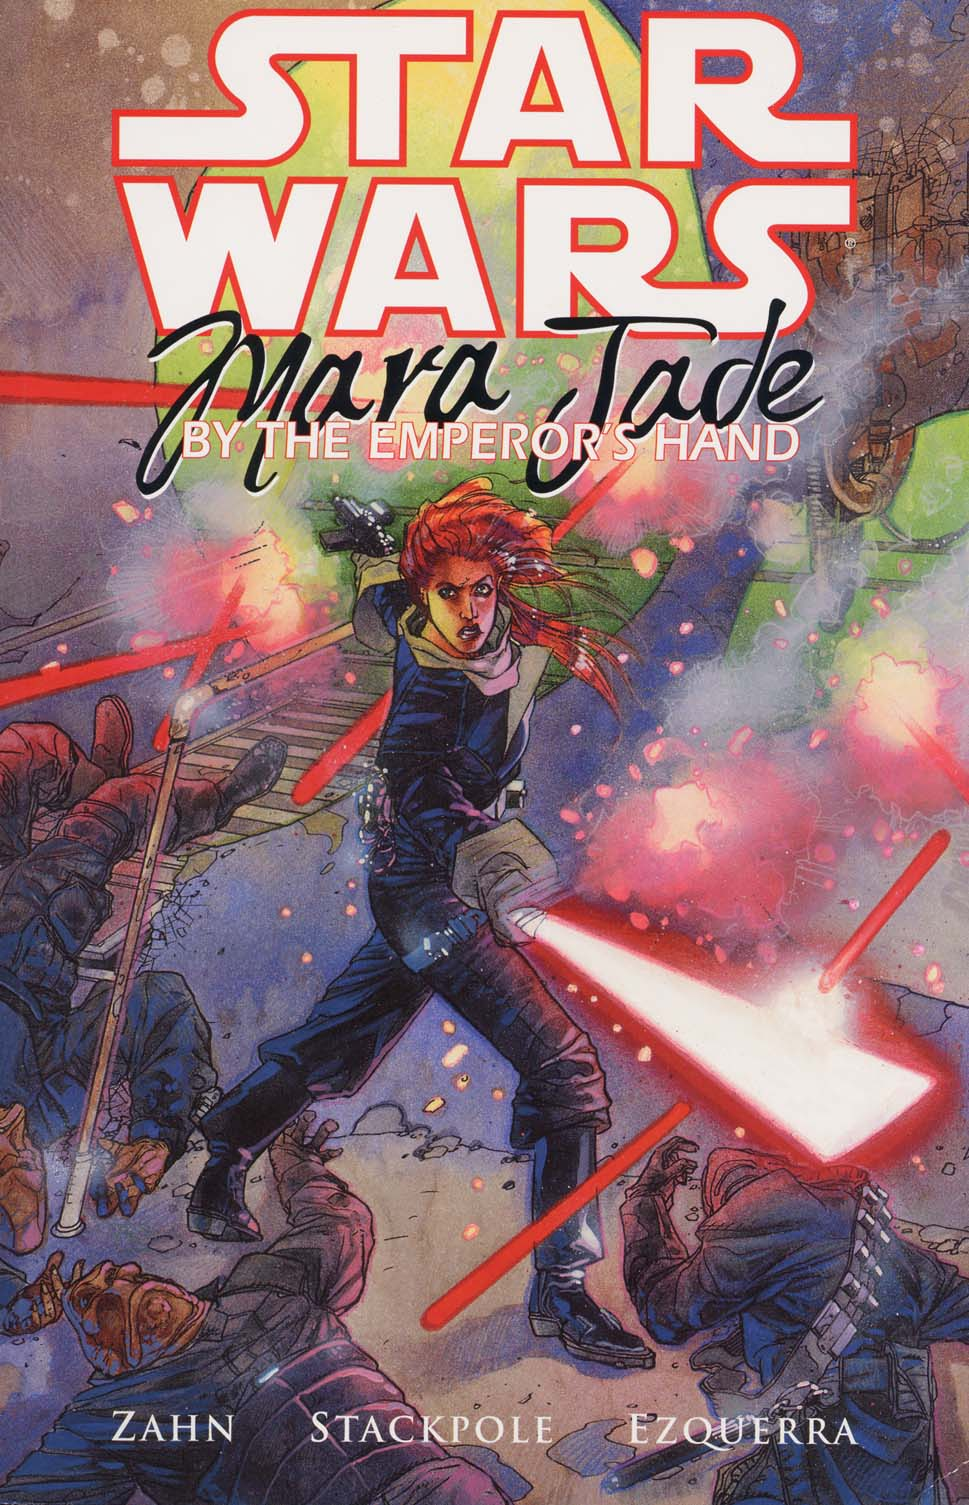 Star Wars: Mara Jade - By The Emperor's Hand